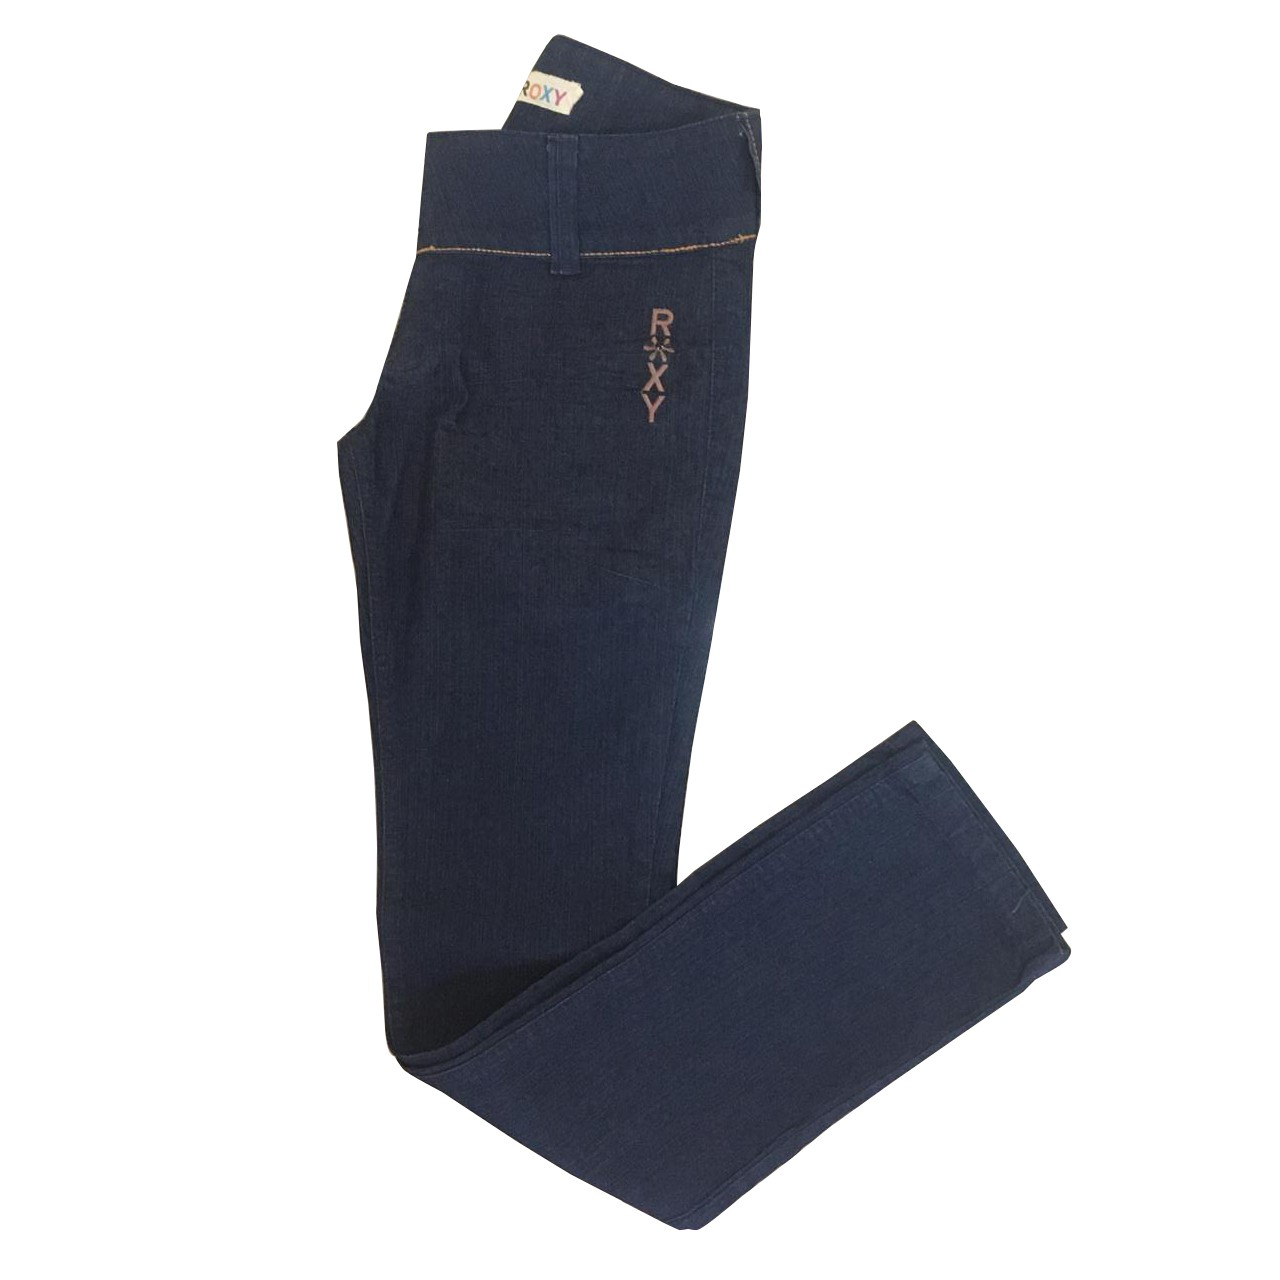 Calça Jeans Roxy Slim Fit Feminina